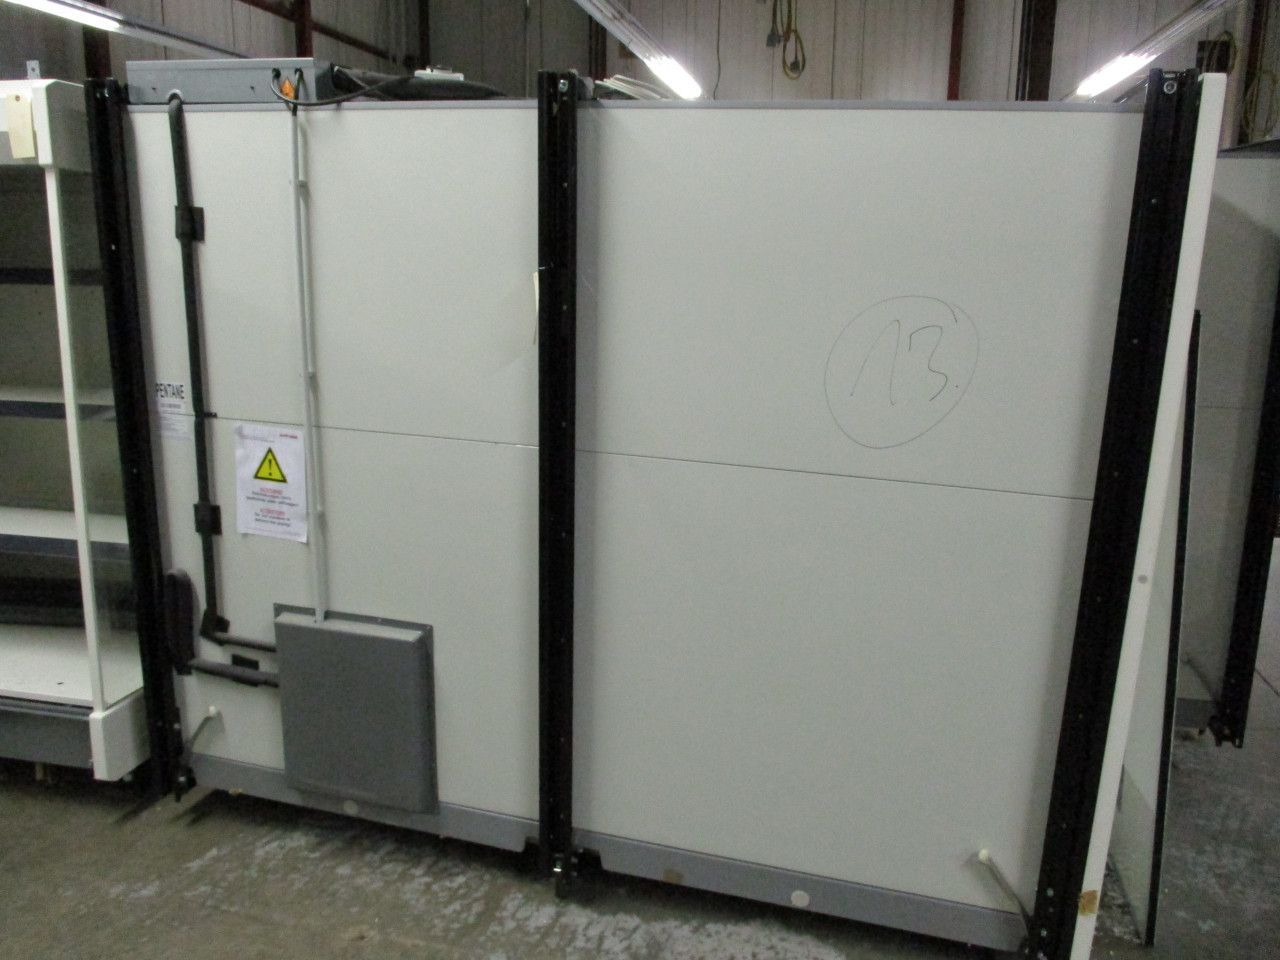 AHT Vento 250 L8 Standkühler